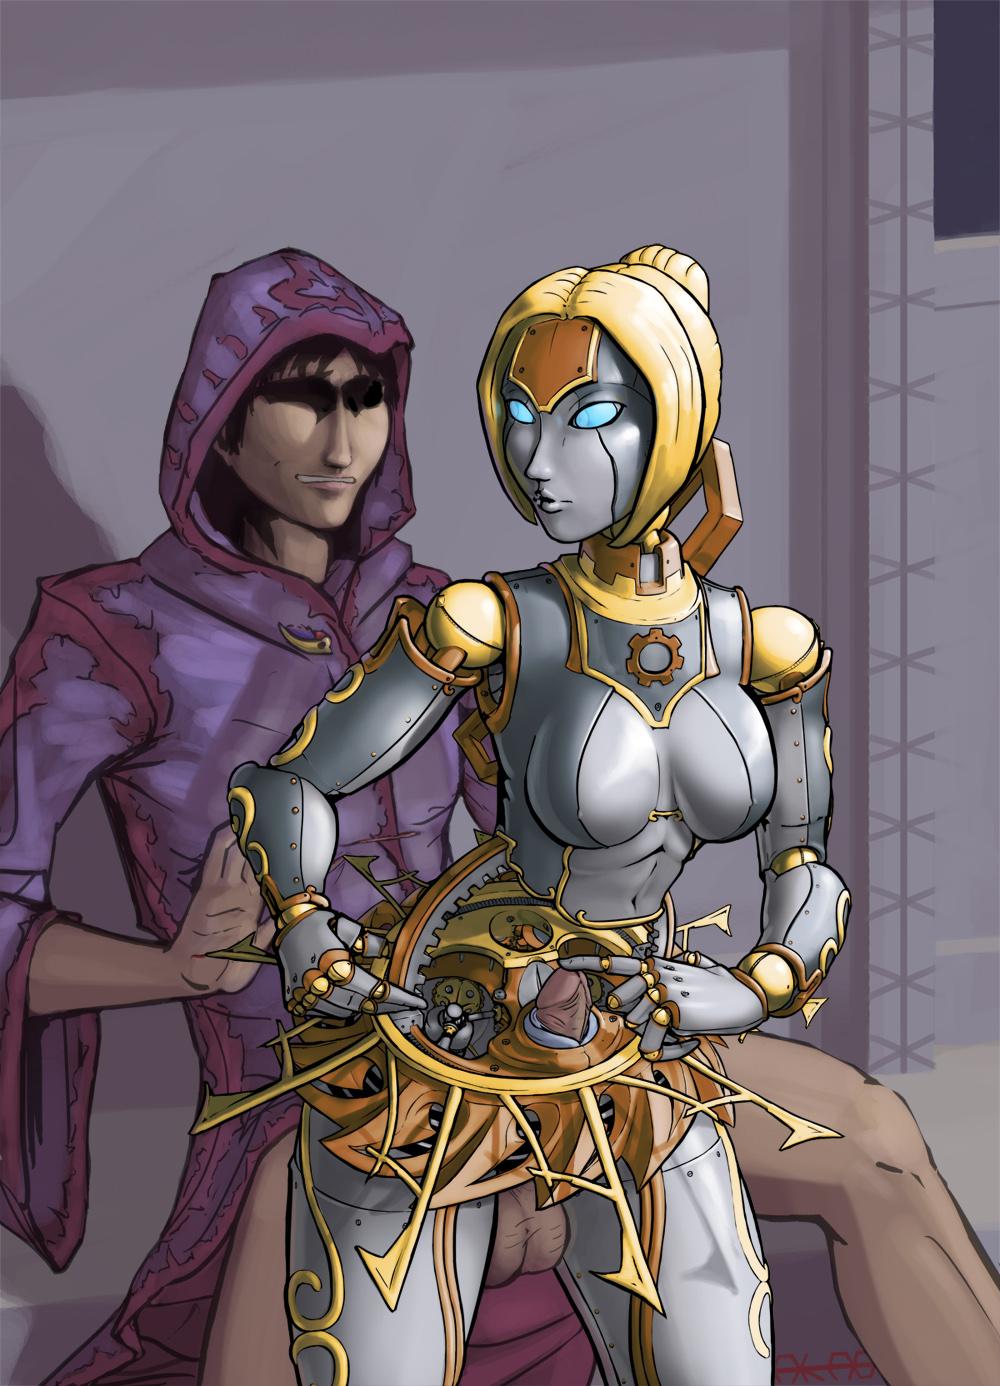 bard legends league female of Gate: jieitai kano chi nite, kaku tatakaeri